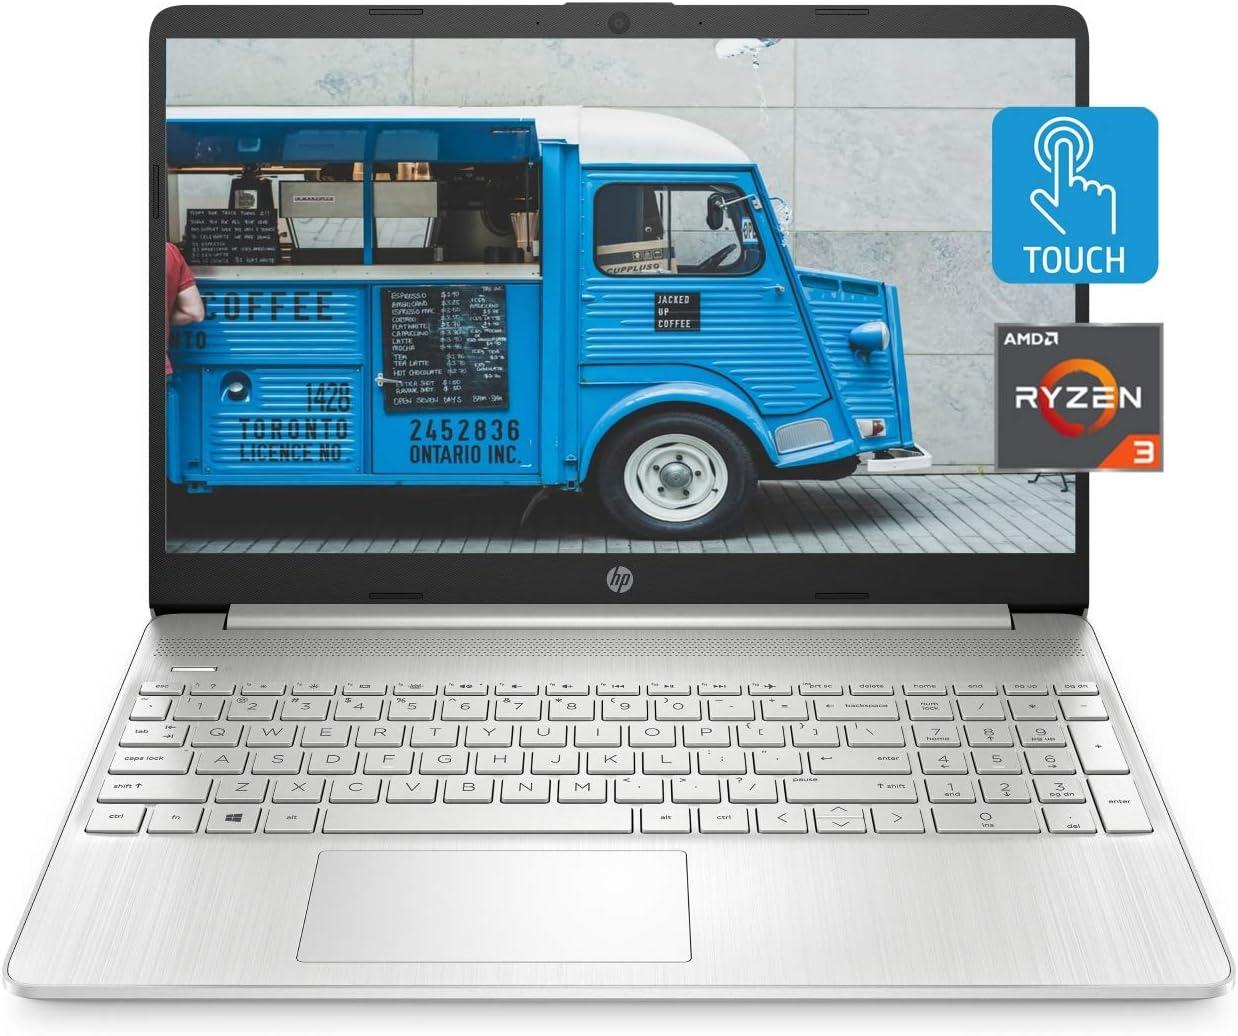 HP 15 Laptop, AMD Ryzen 3 3250U Processor, 8 GB RAM, 256 GB SSD Storage, 15.6-inch HD Micro-Edge Display, Windows 10 Home, Long-Lasting Battery, HP Fast Charge, 720p Webcam (15-ef1021nr, 2020)